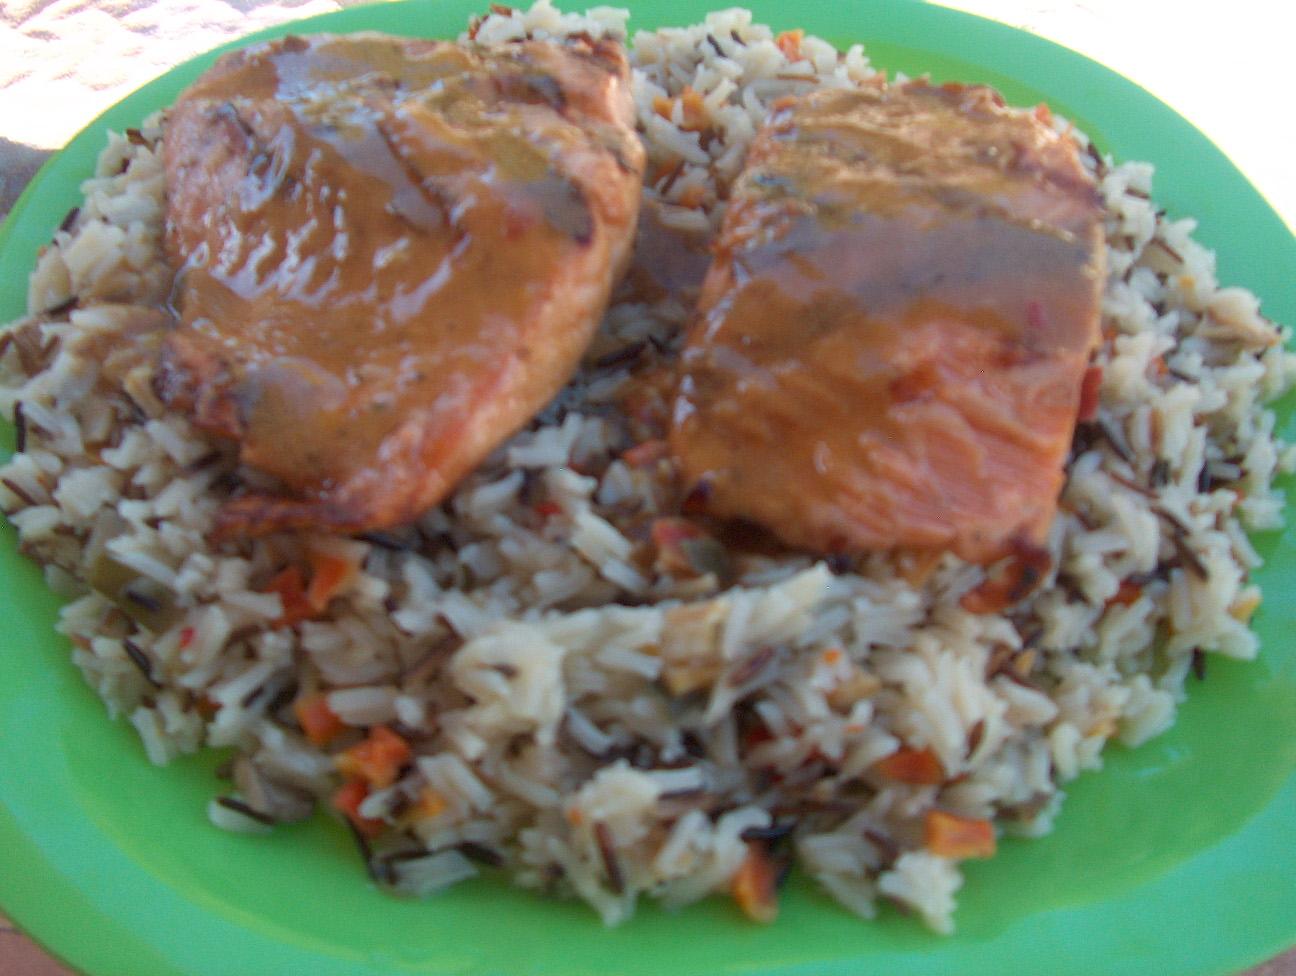 Cooking in the Desert: Grilled Slammin Salmon